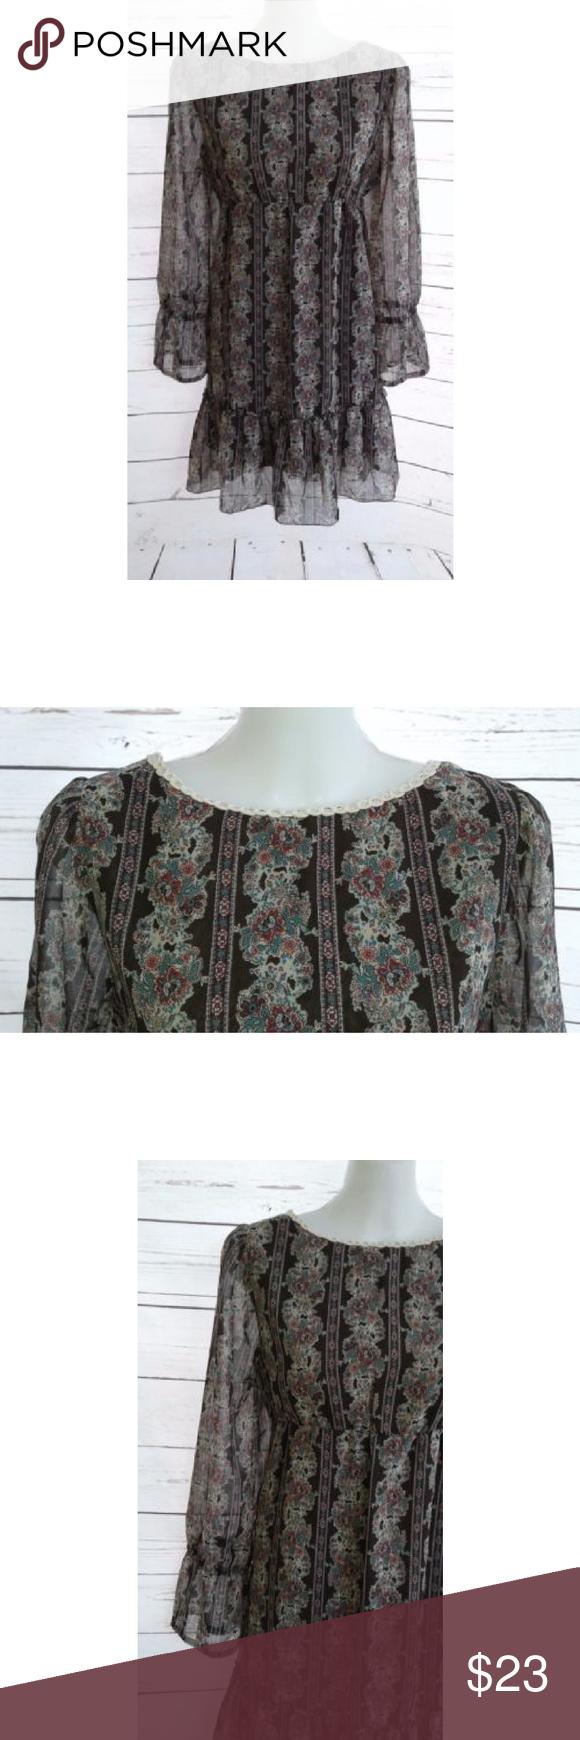 Floral empire waist dress long sleeve medium pinterest arm pits